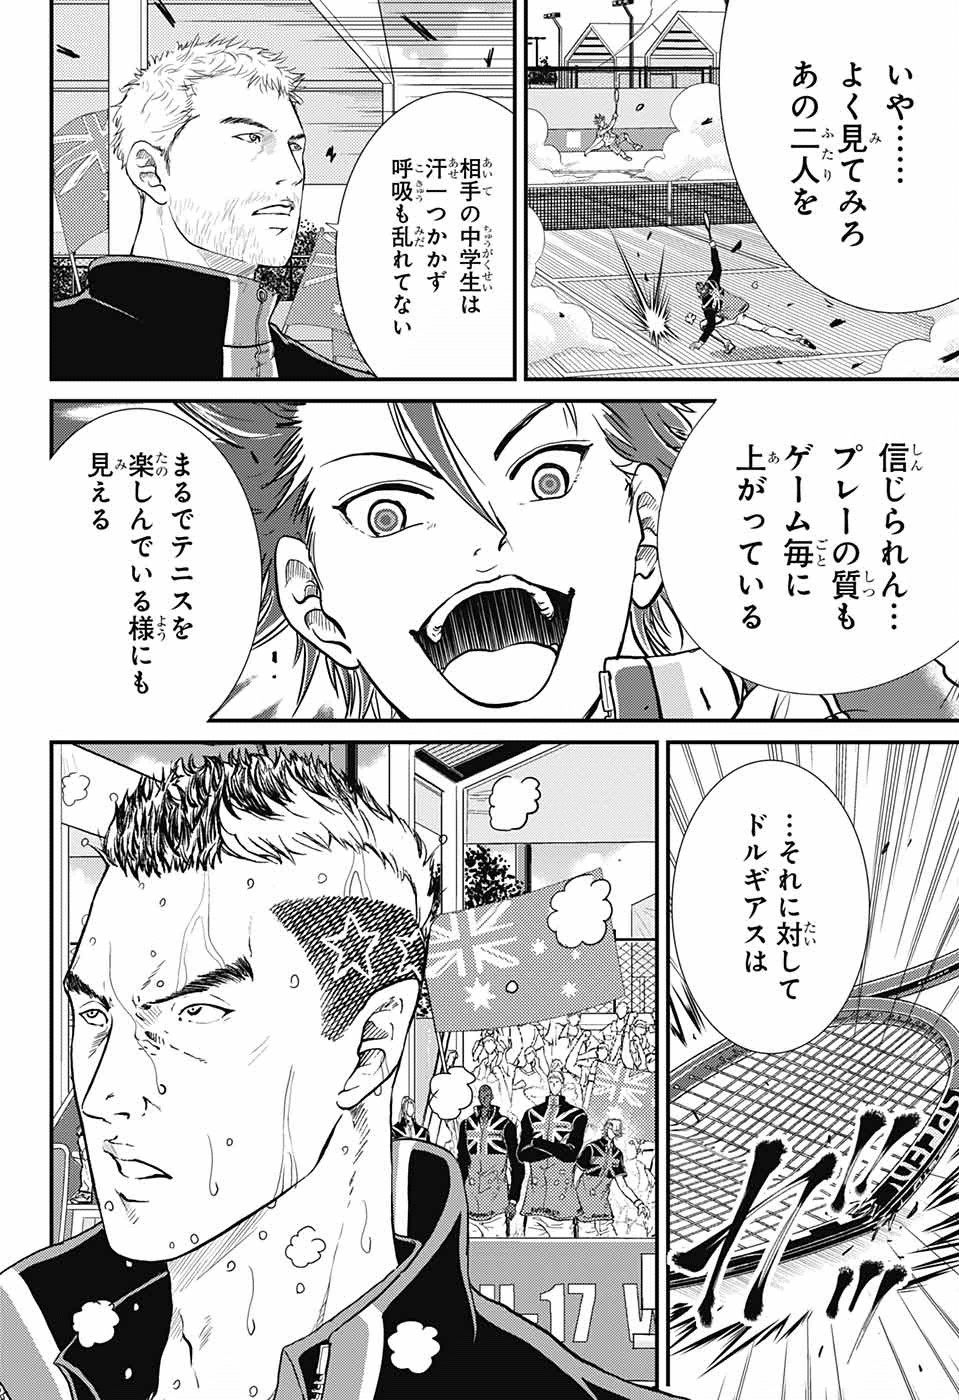 New Prince of Tennis 209 JP